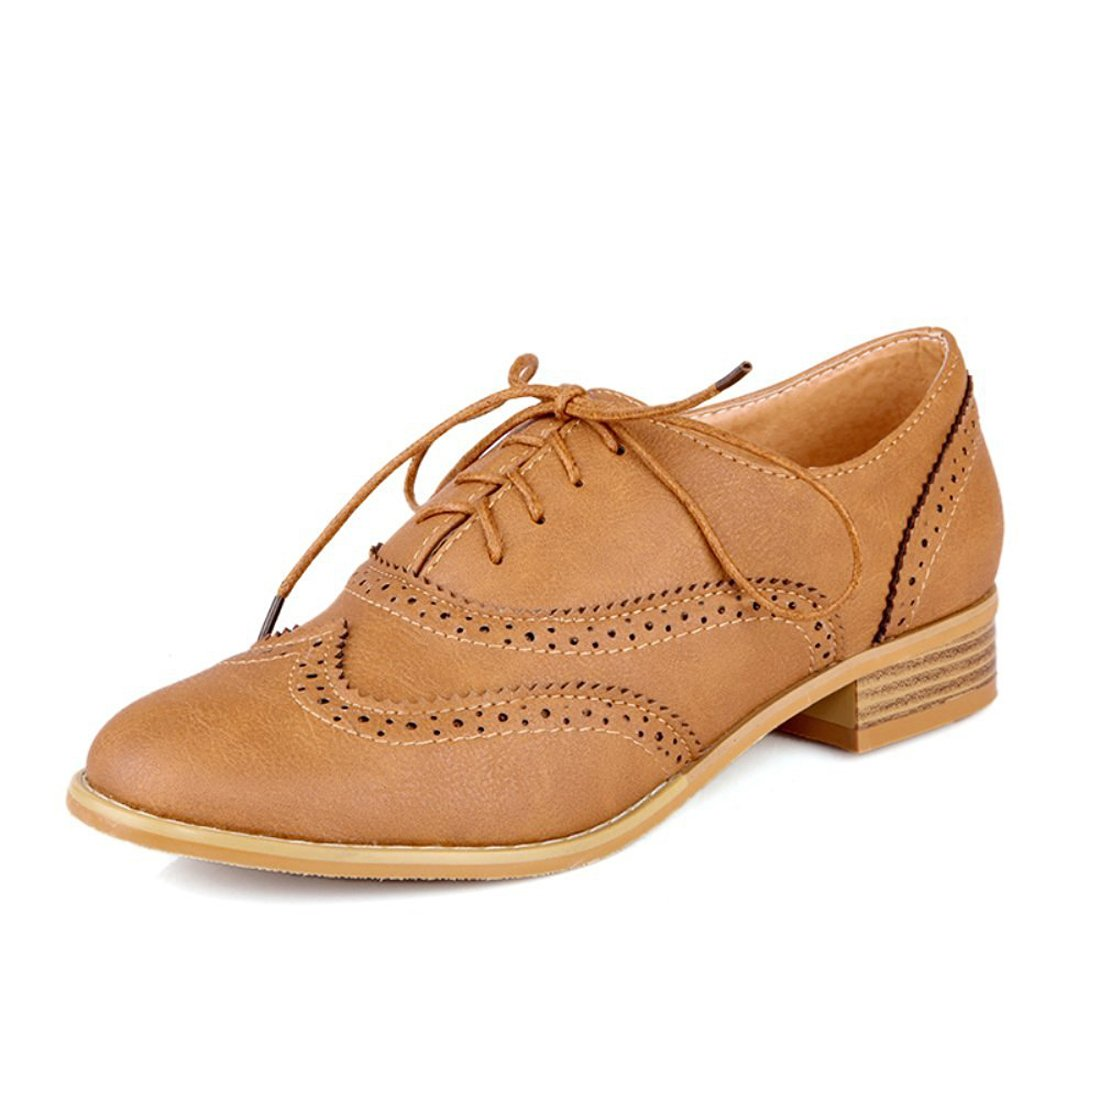 Susanny Women Classic Modern Sweet Low Heel Lace up Carving Wingtip PU Yellow Brogue Oxfords Dress Shoes 9.5 B (M) US